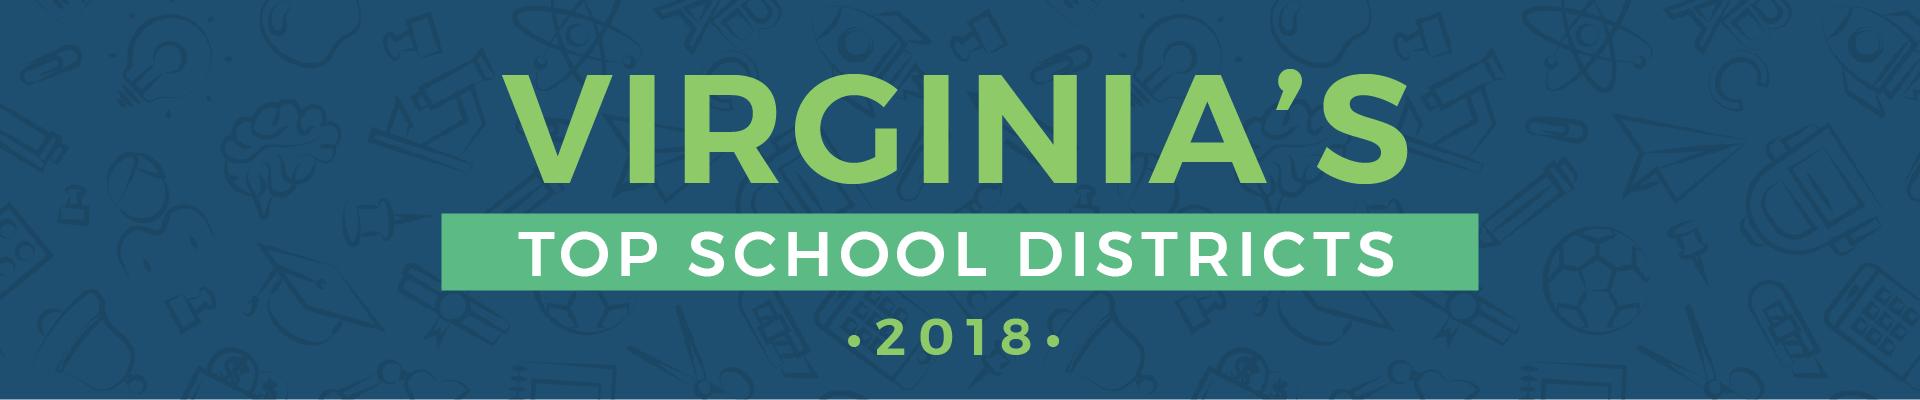 Top School Districts in Virginia, 2018 | BackgroundChecks org